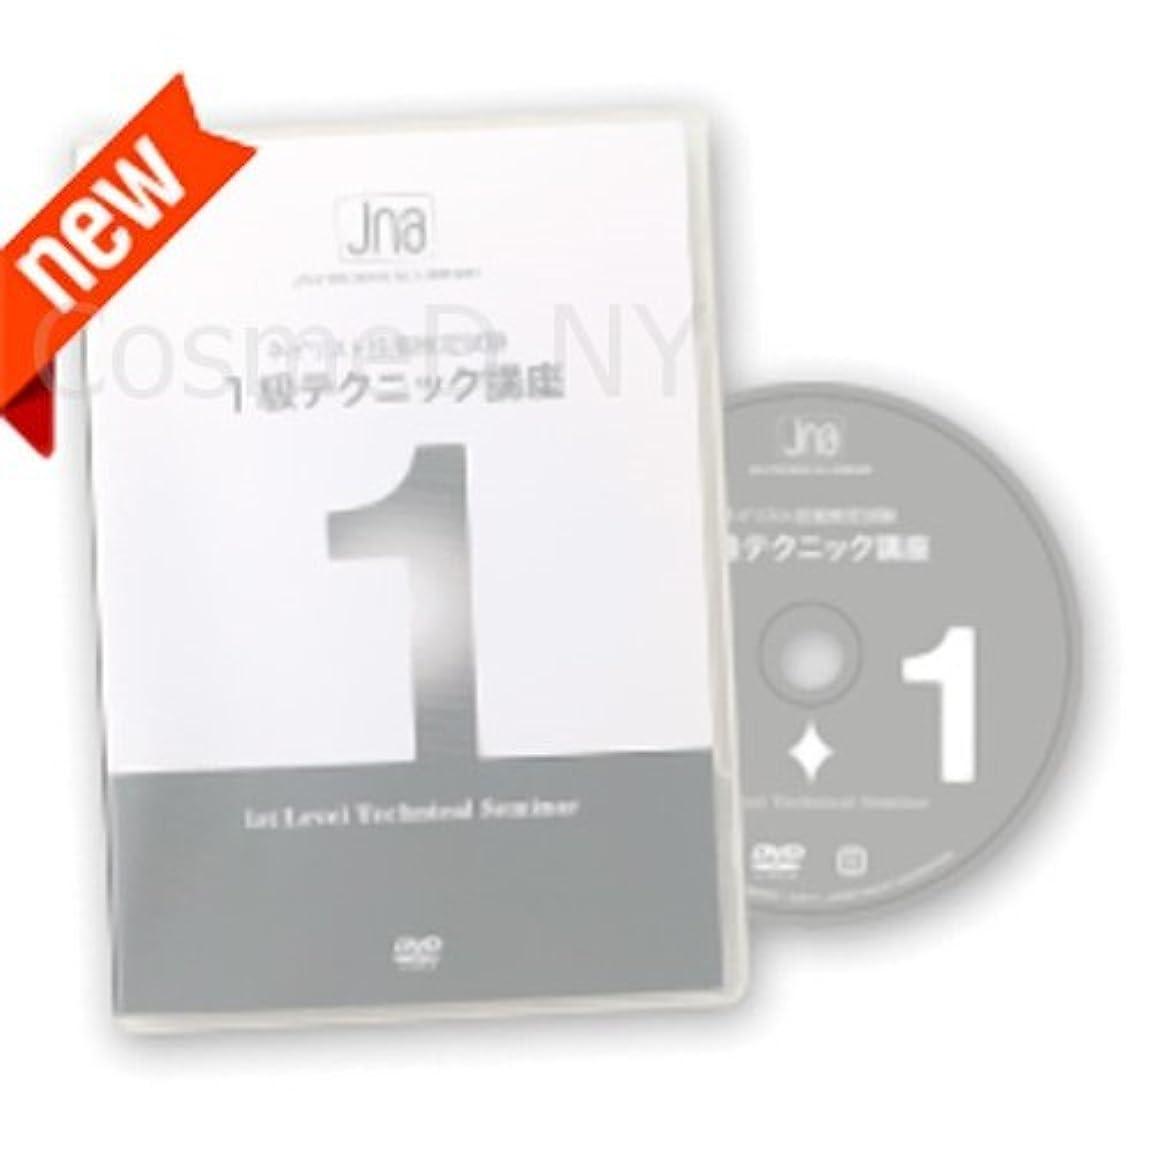 ジェム魔術師無駄にVideo ?????技能検定試験1級?????講座DVD 【書籍/DVD】